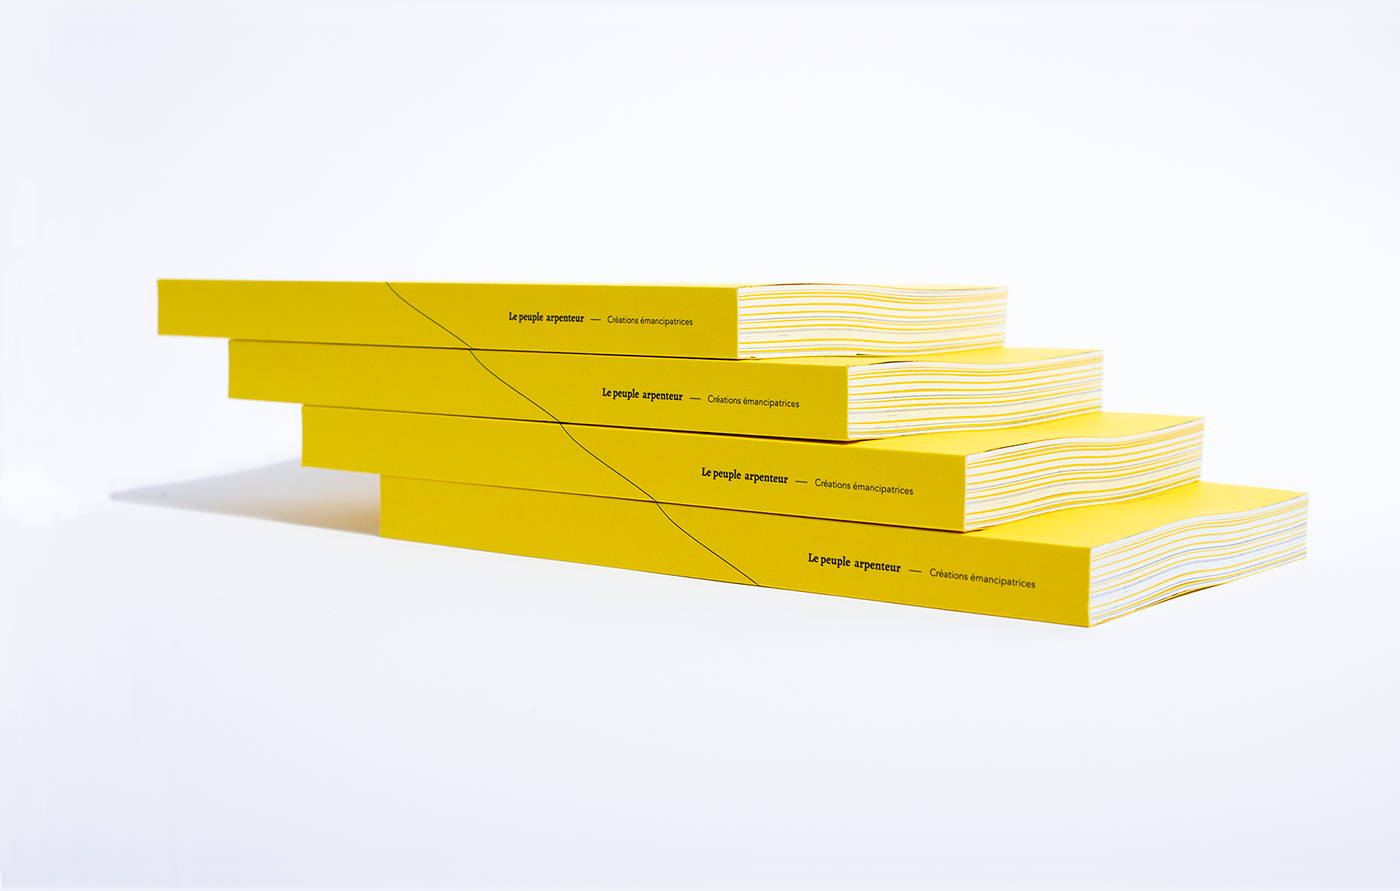 Peuple arpenteur editorial print OBNL artist Association yellow purple Montreal